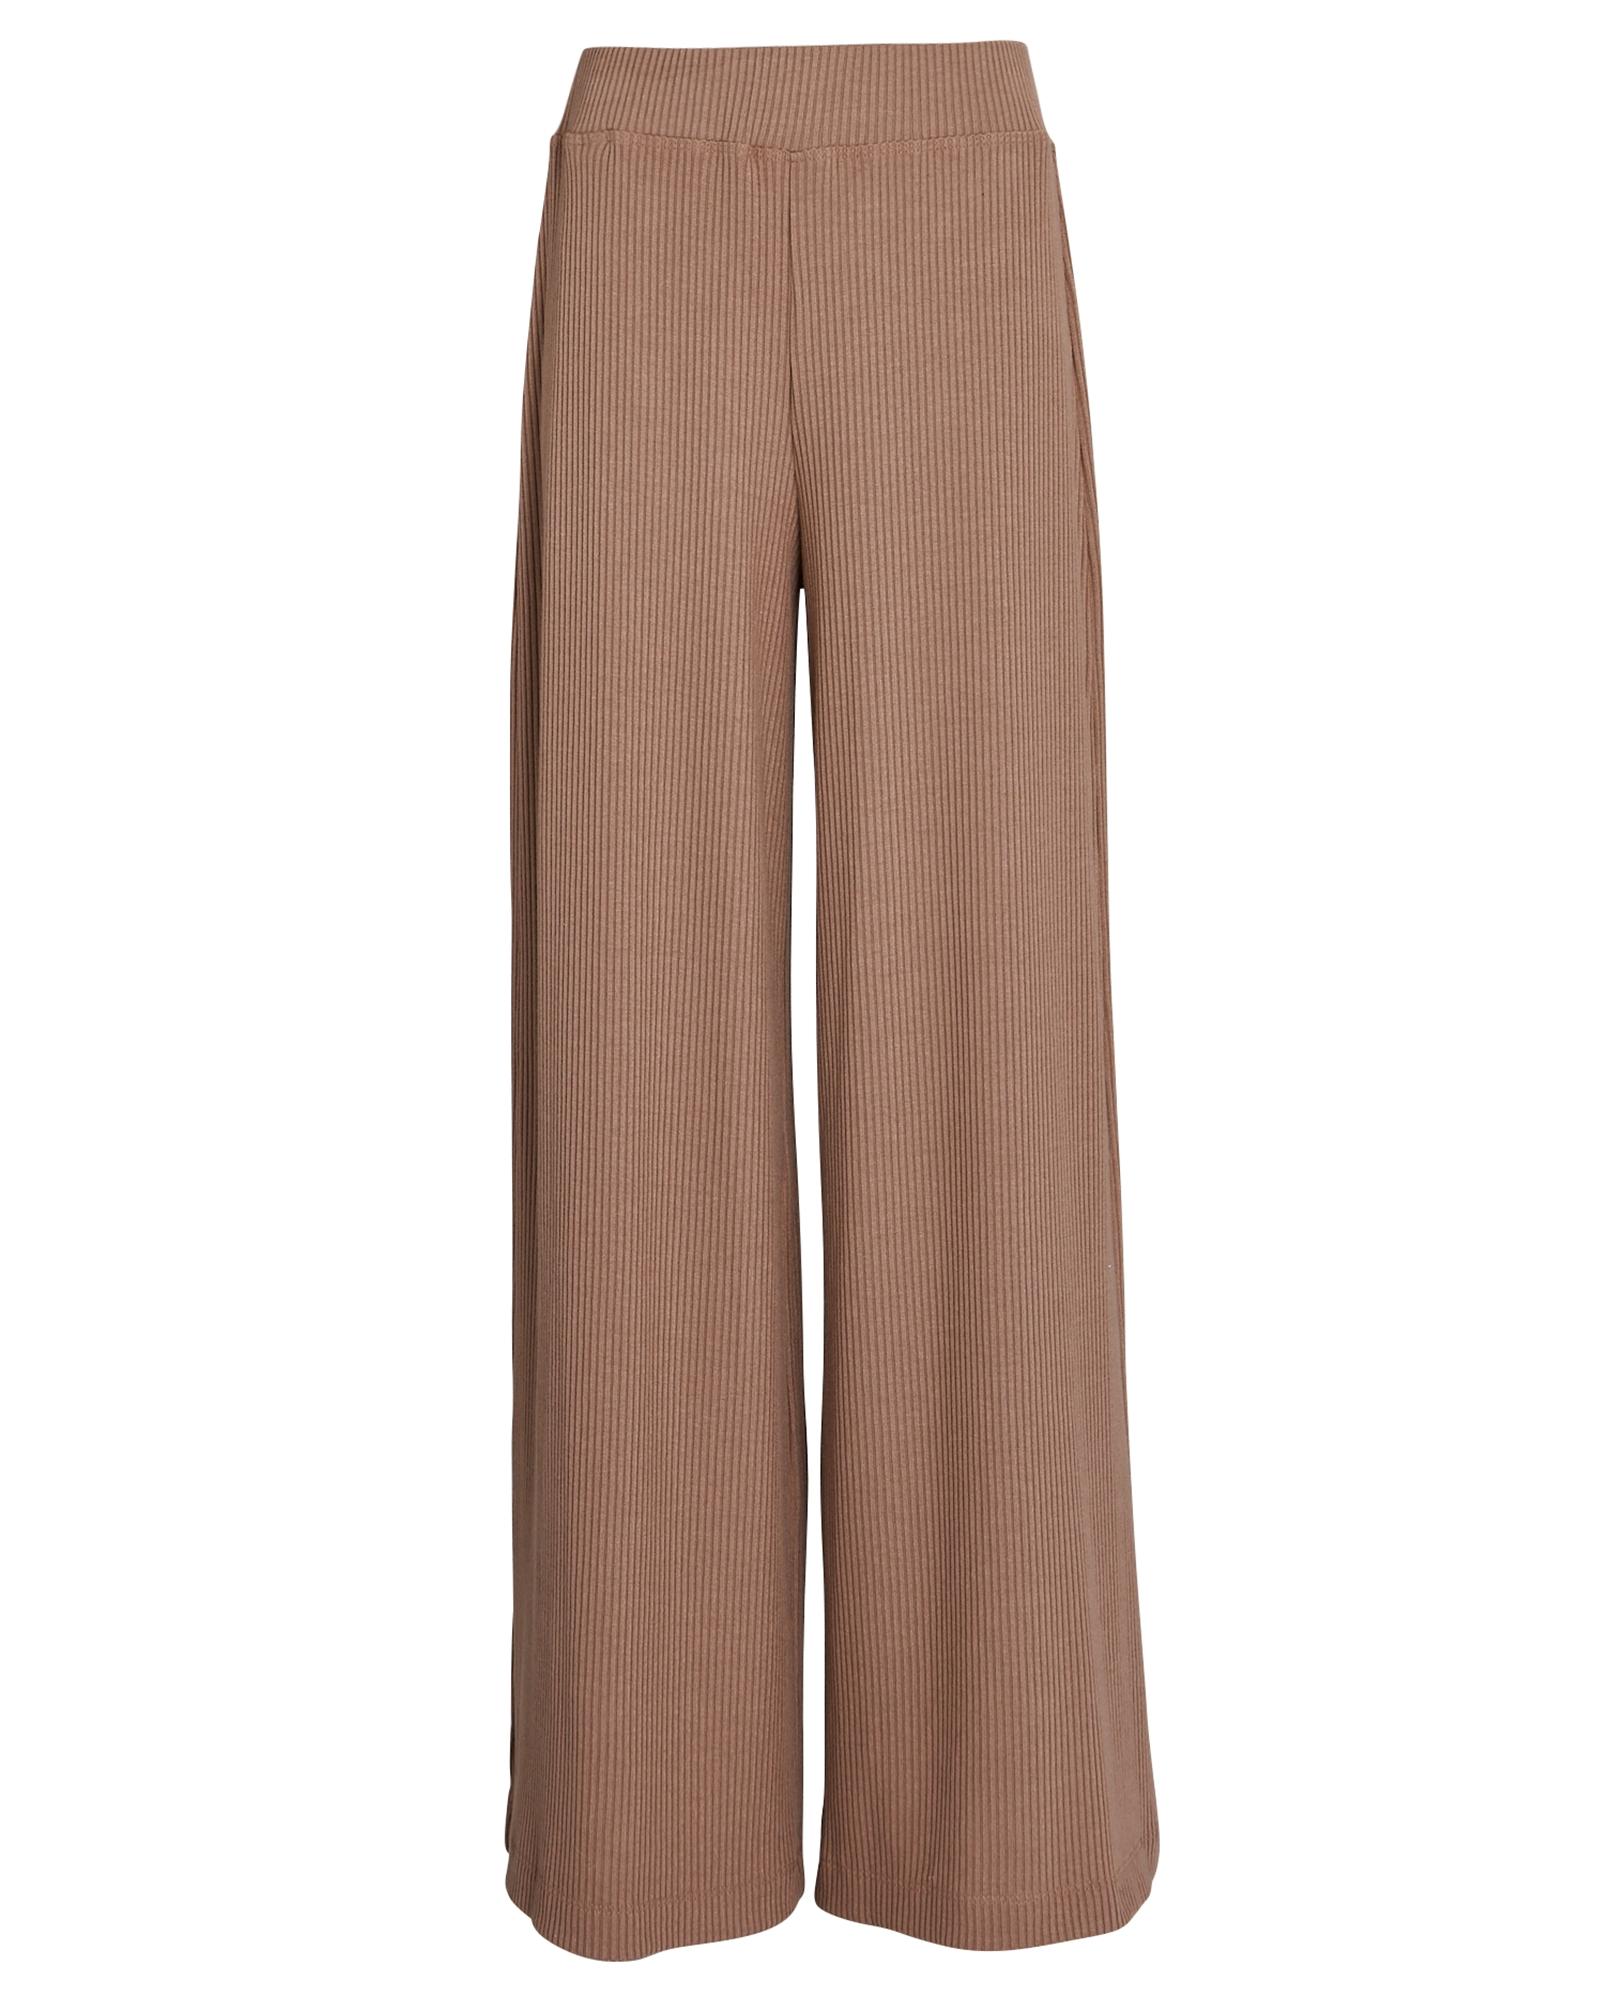 L Agence The Crawford Rib Knit Wide-Leg Pants